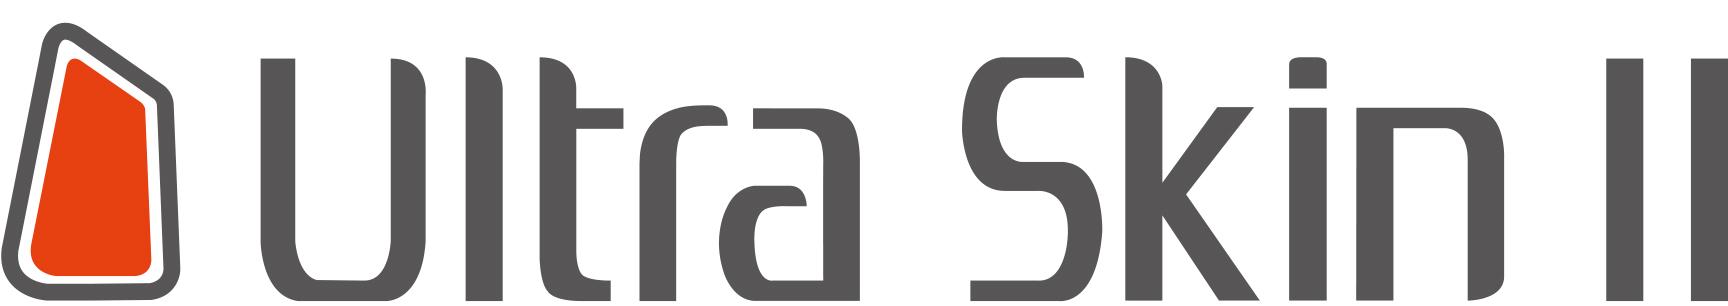 logo ULTRASKIN